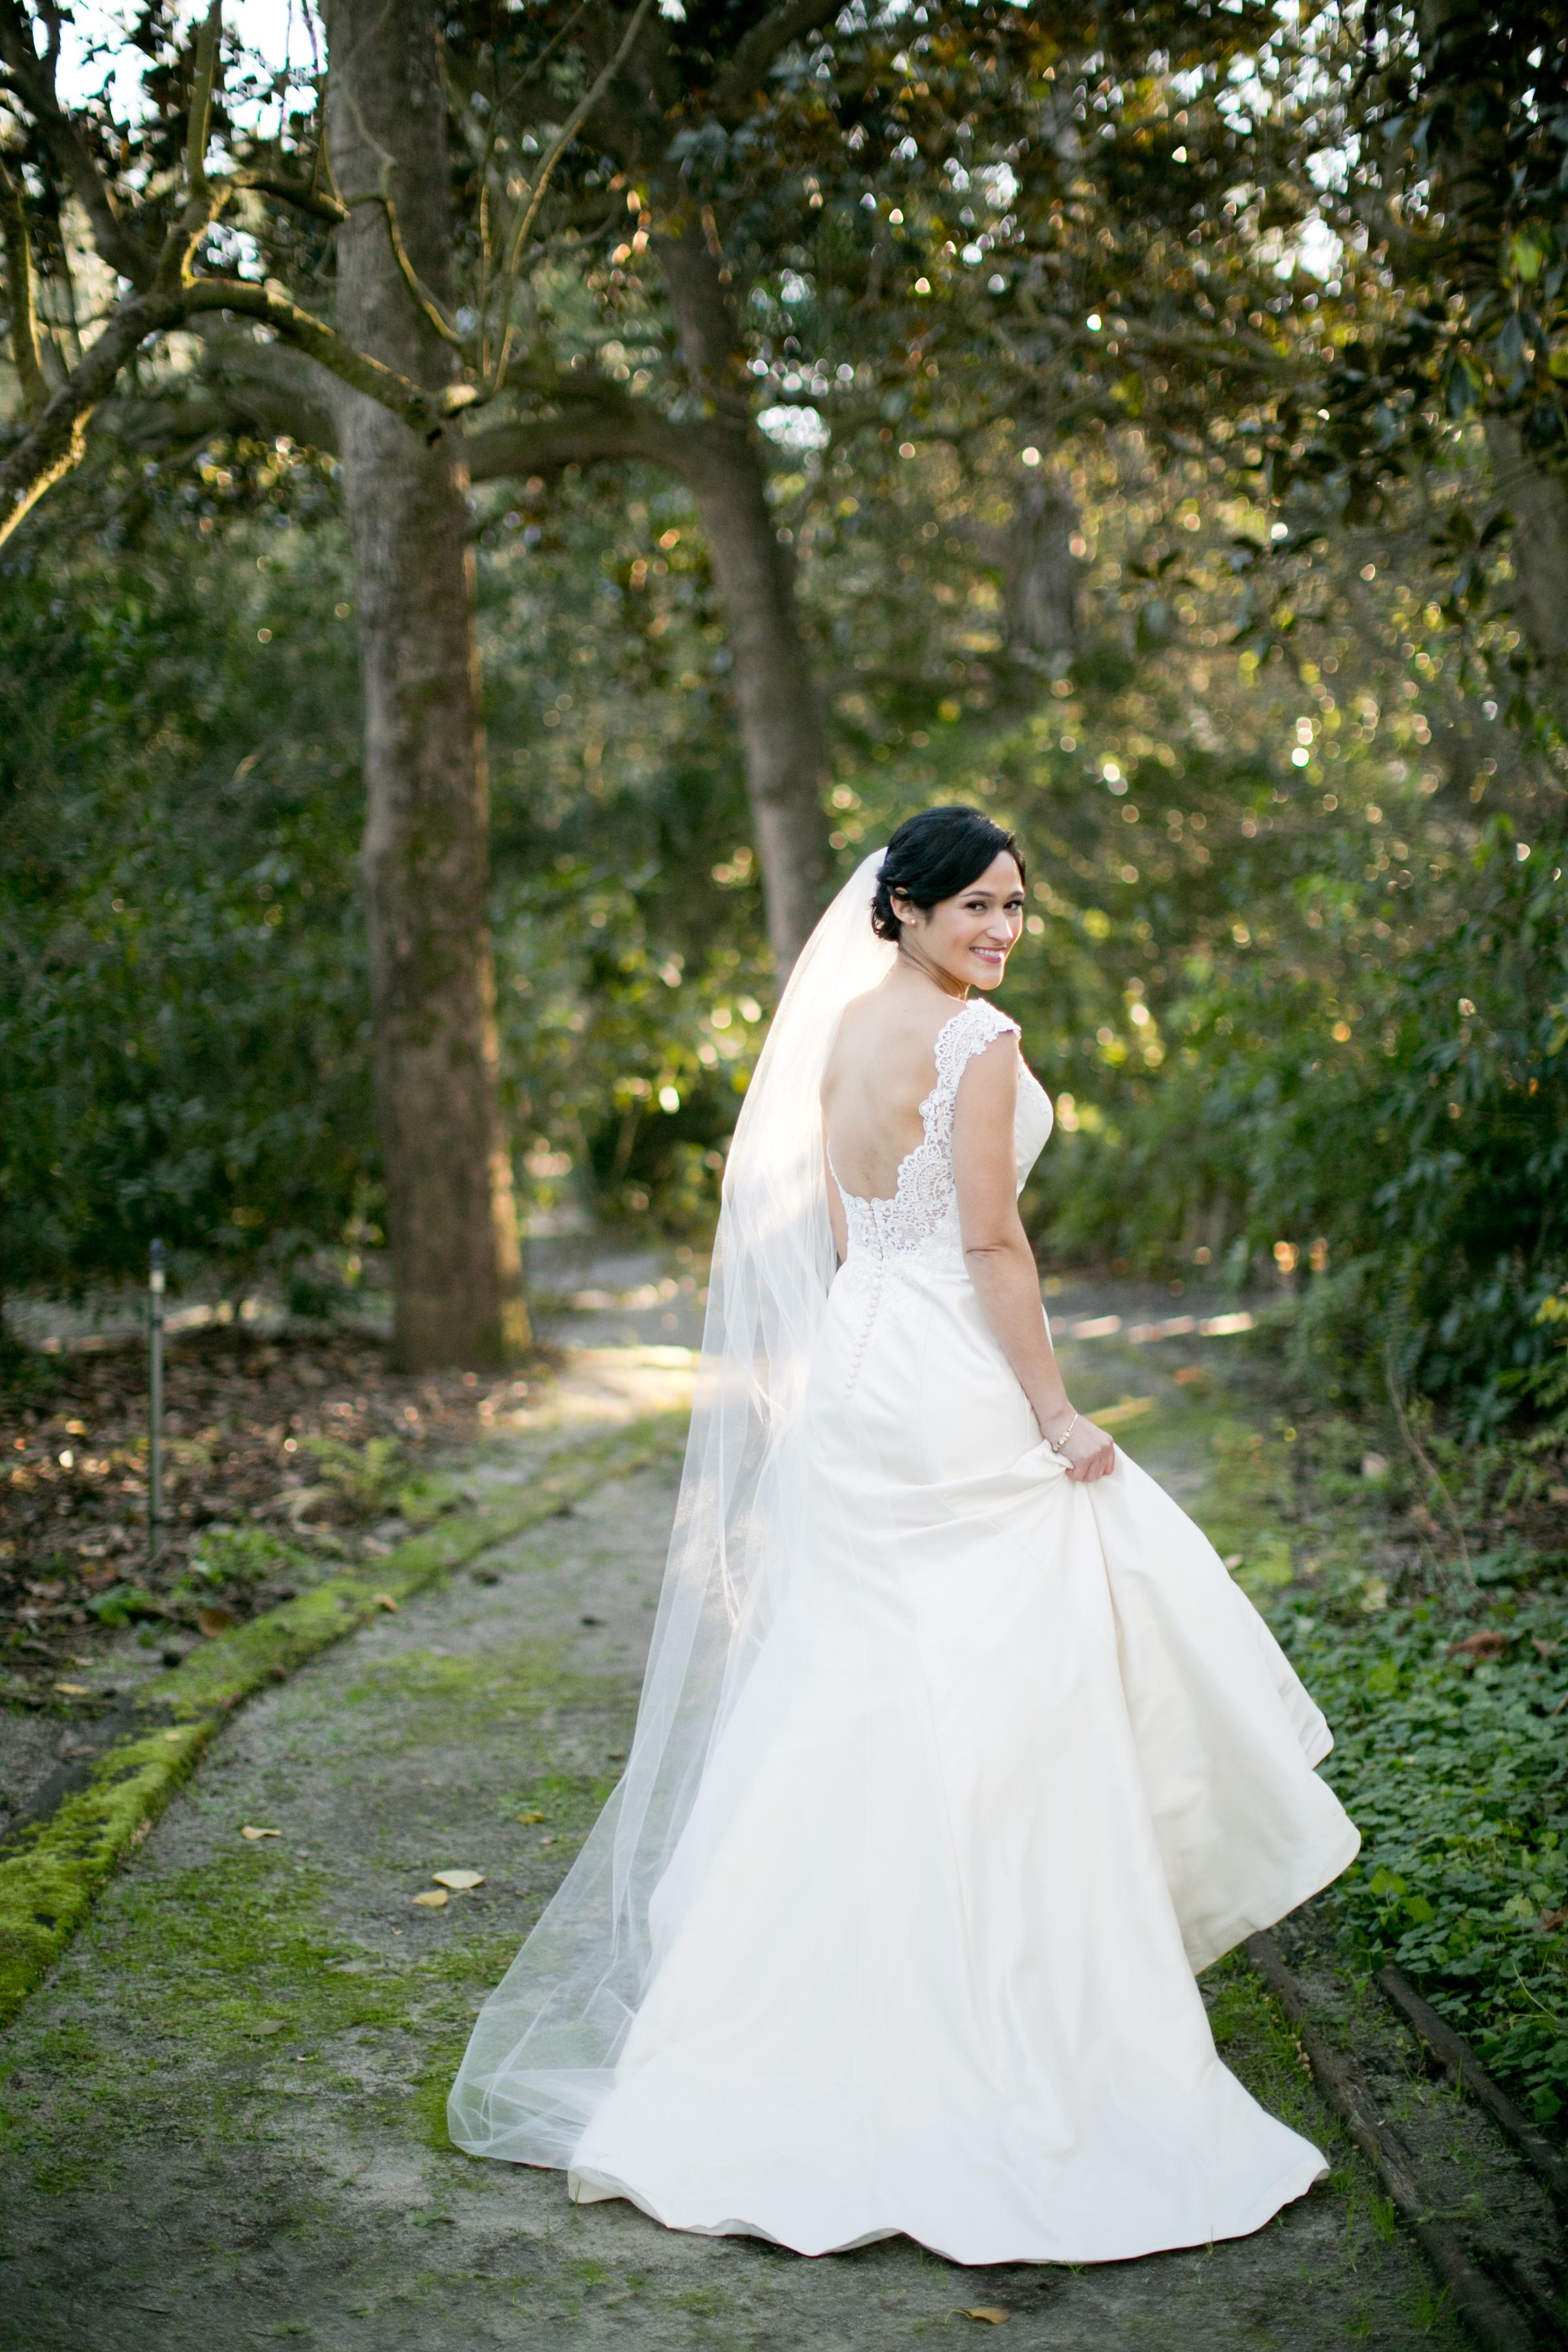 columbia_sc_wedding_photo119.jpg